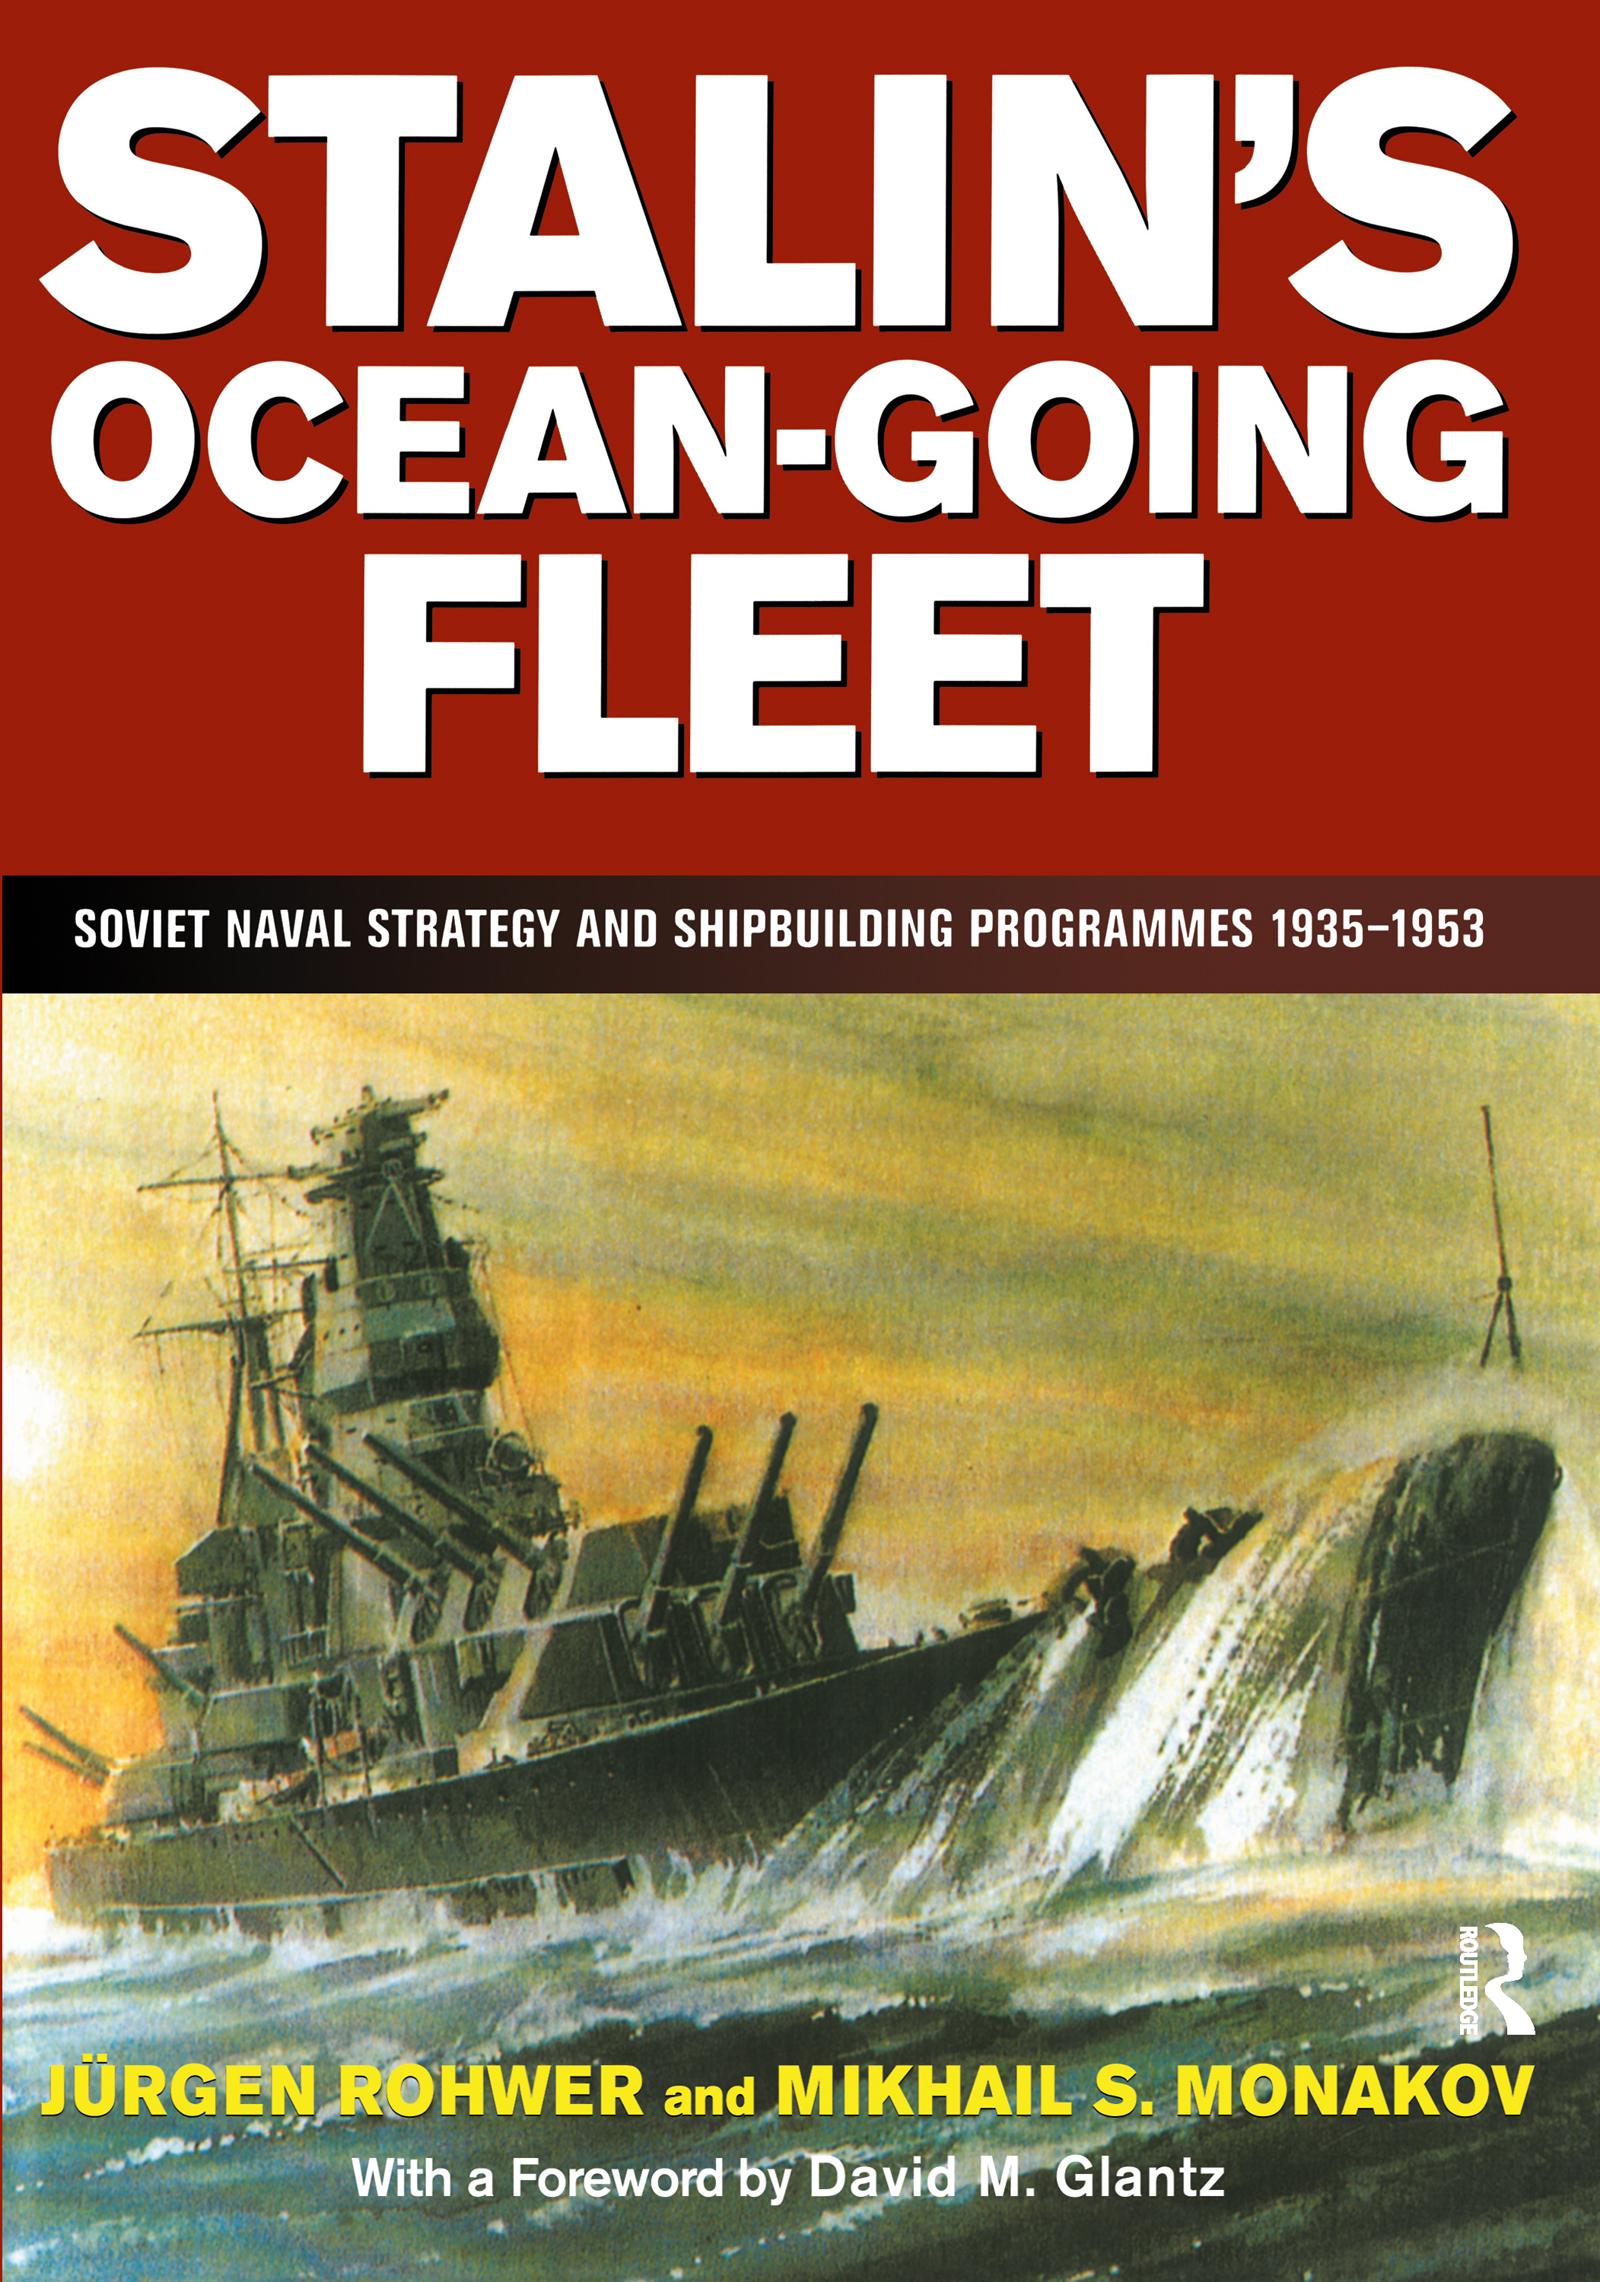 Stalin's Ocean-going Fleet: Soviet